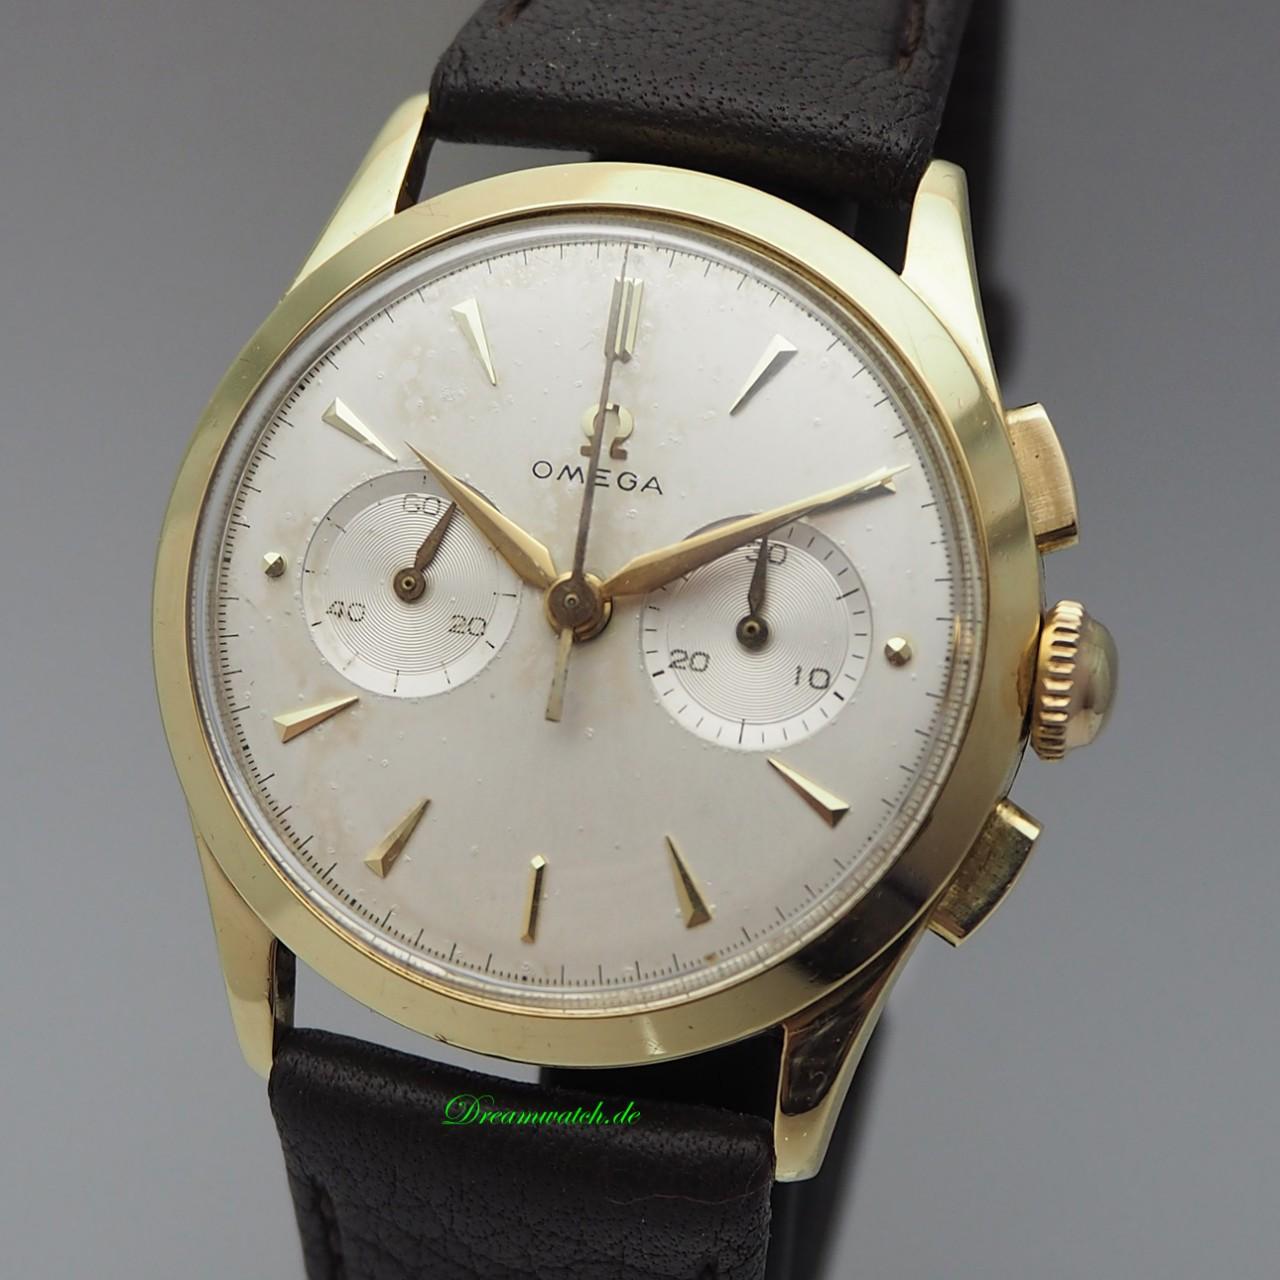 Omega Vintage Chronograph 2-Register Cal. 320 -18k/750 Gold from 1957